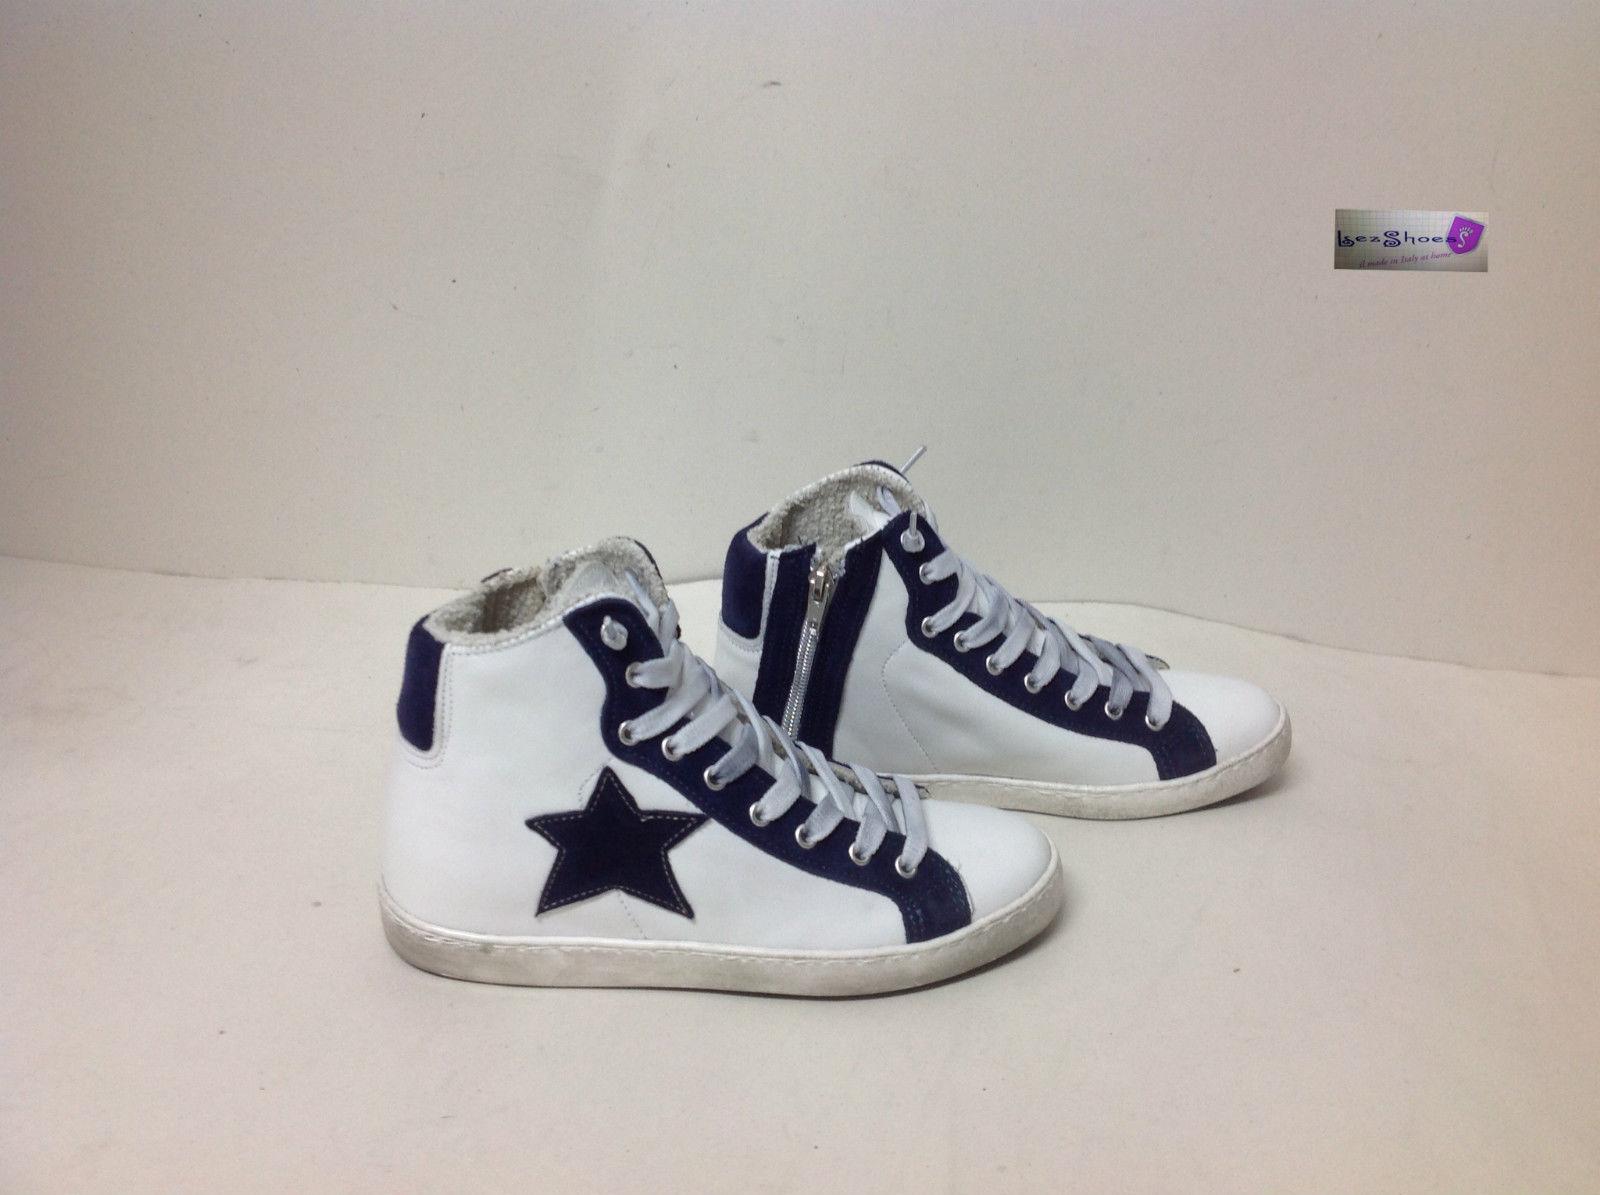 scarpe sneakers alte uomo pelle Via Condotti bianco stella b  af9c823f487